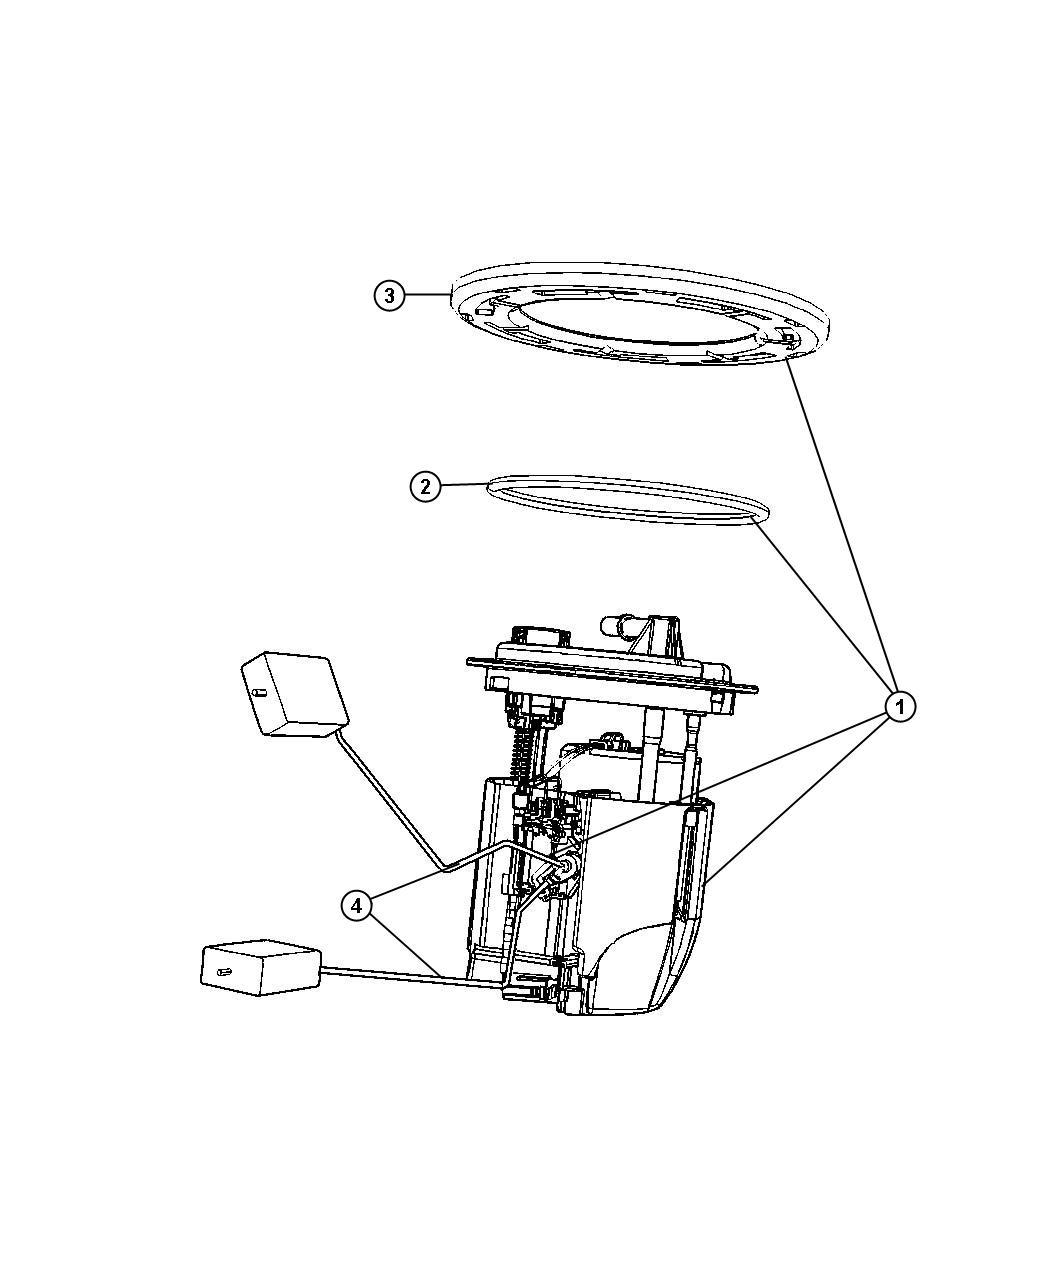 2001 nissan maxima radio wiring diagram dodge caliber srt 4 engine